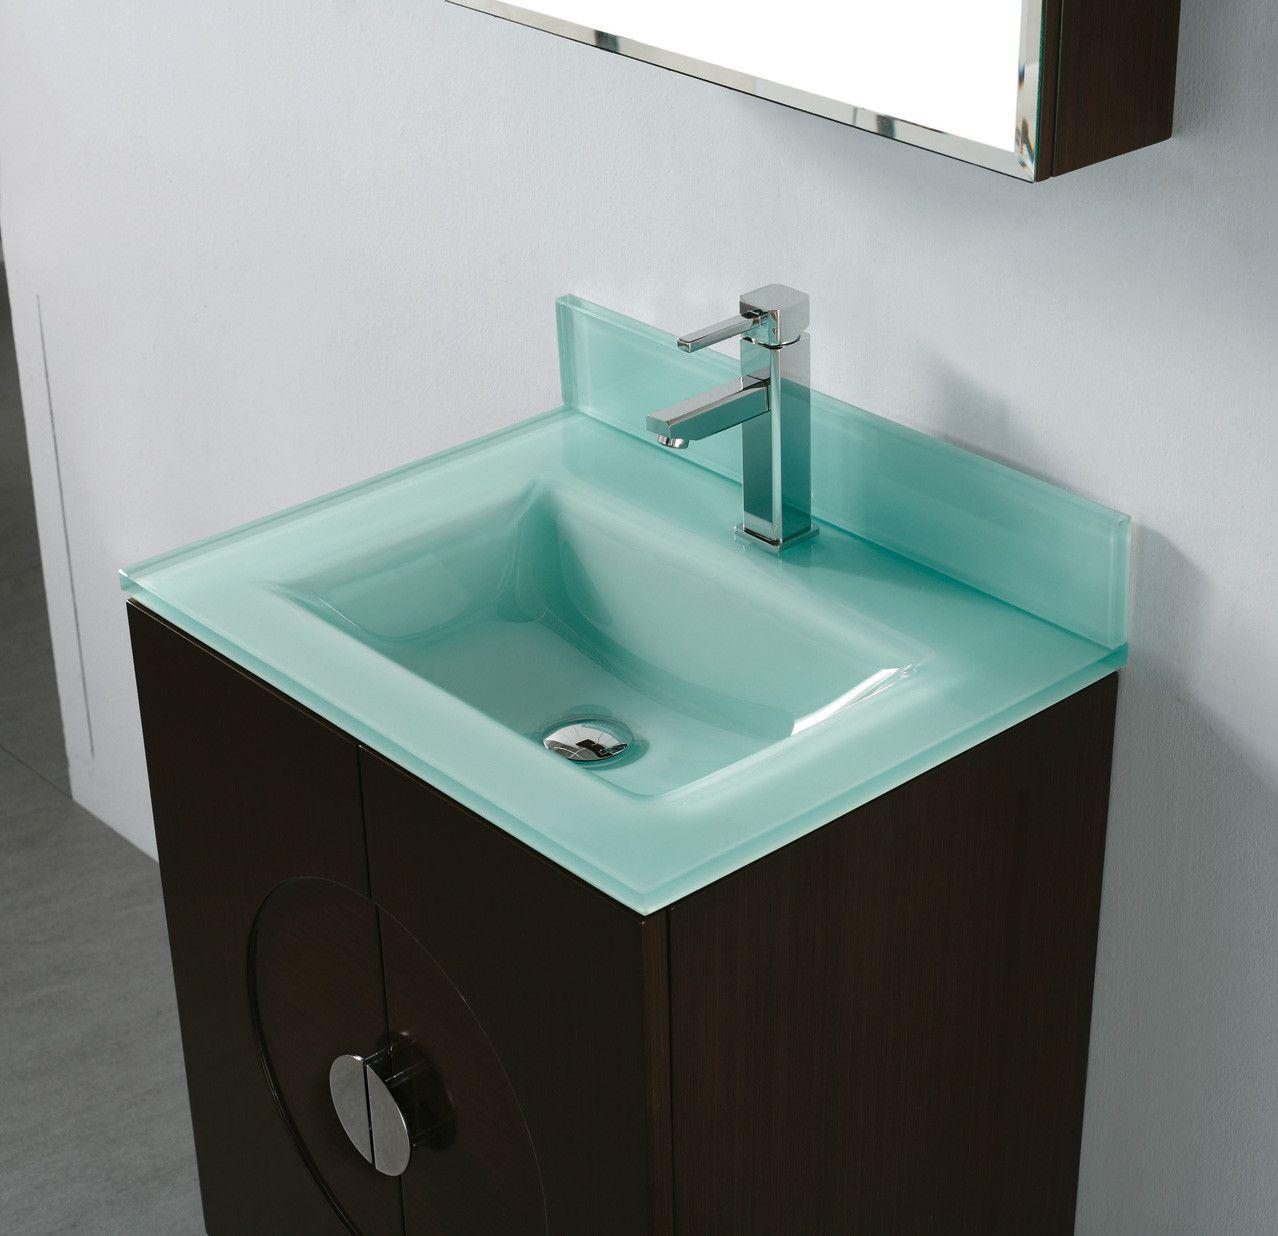 wayfair-bathroom-sinks-1 wayfair bathroom sinks